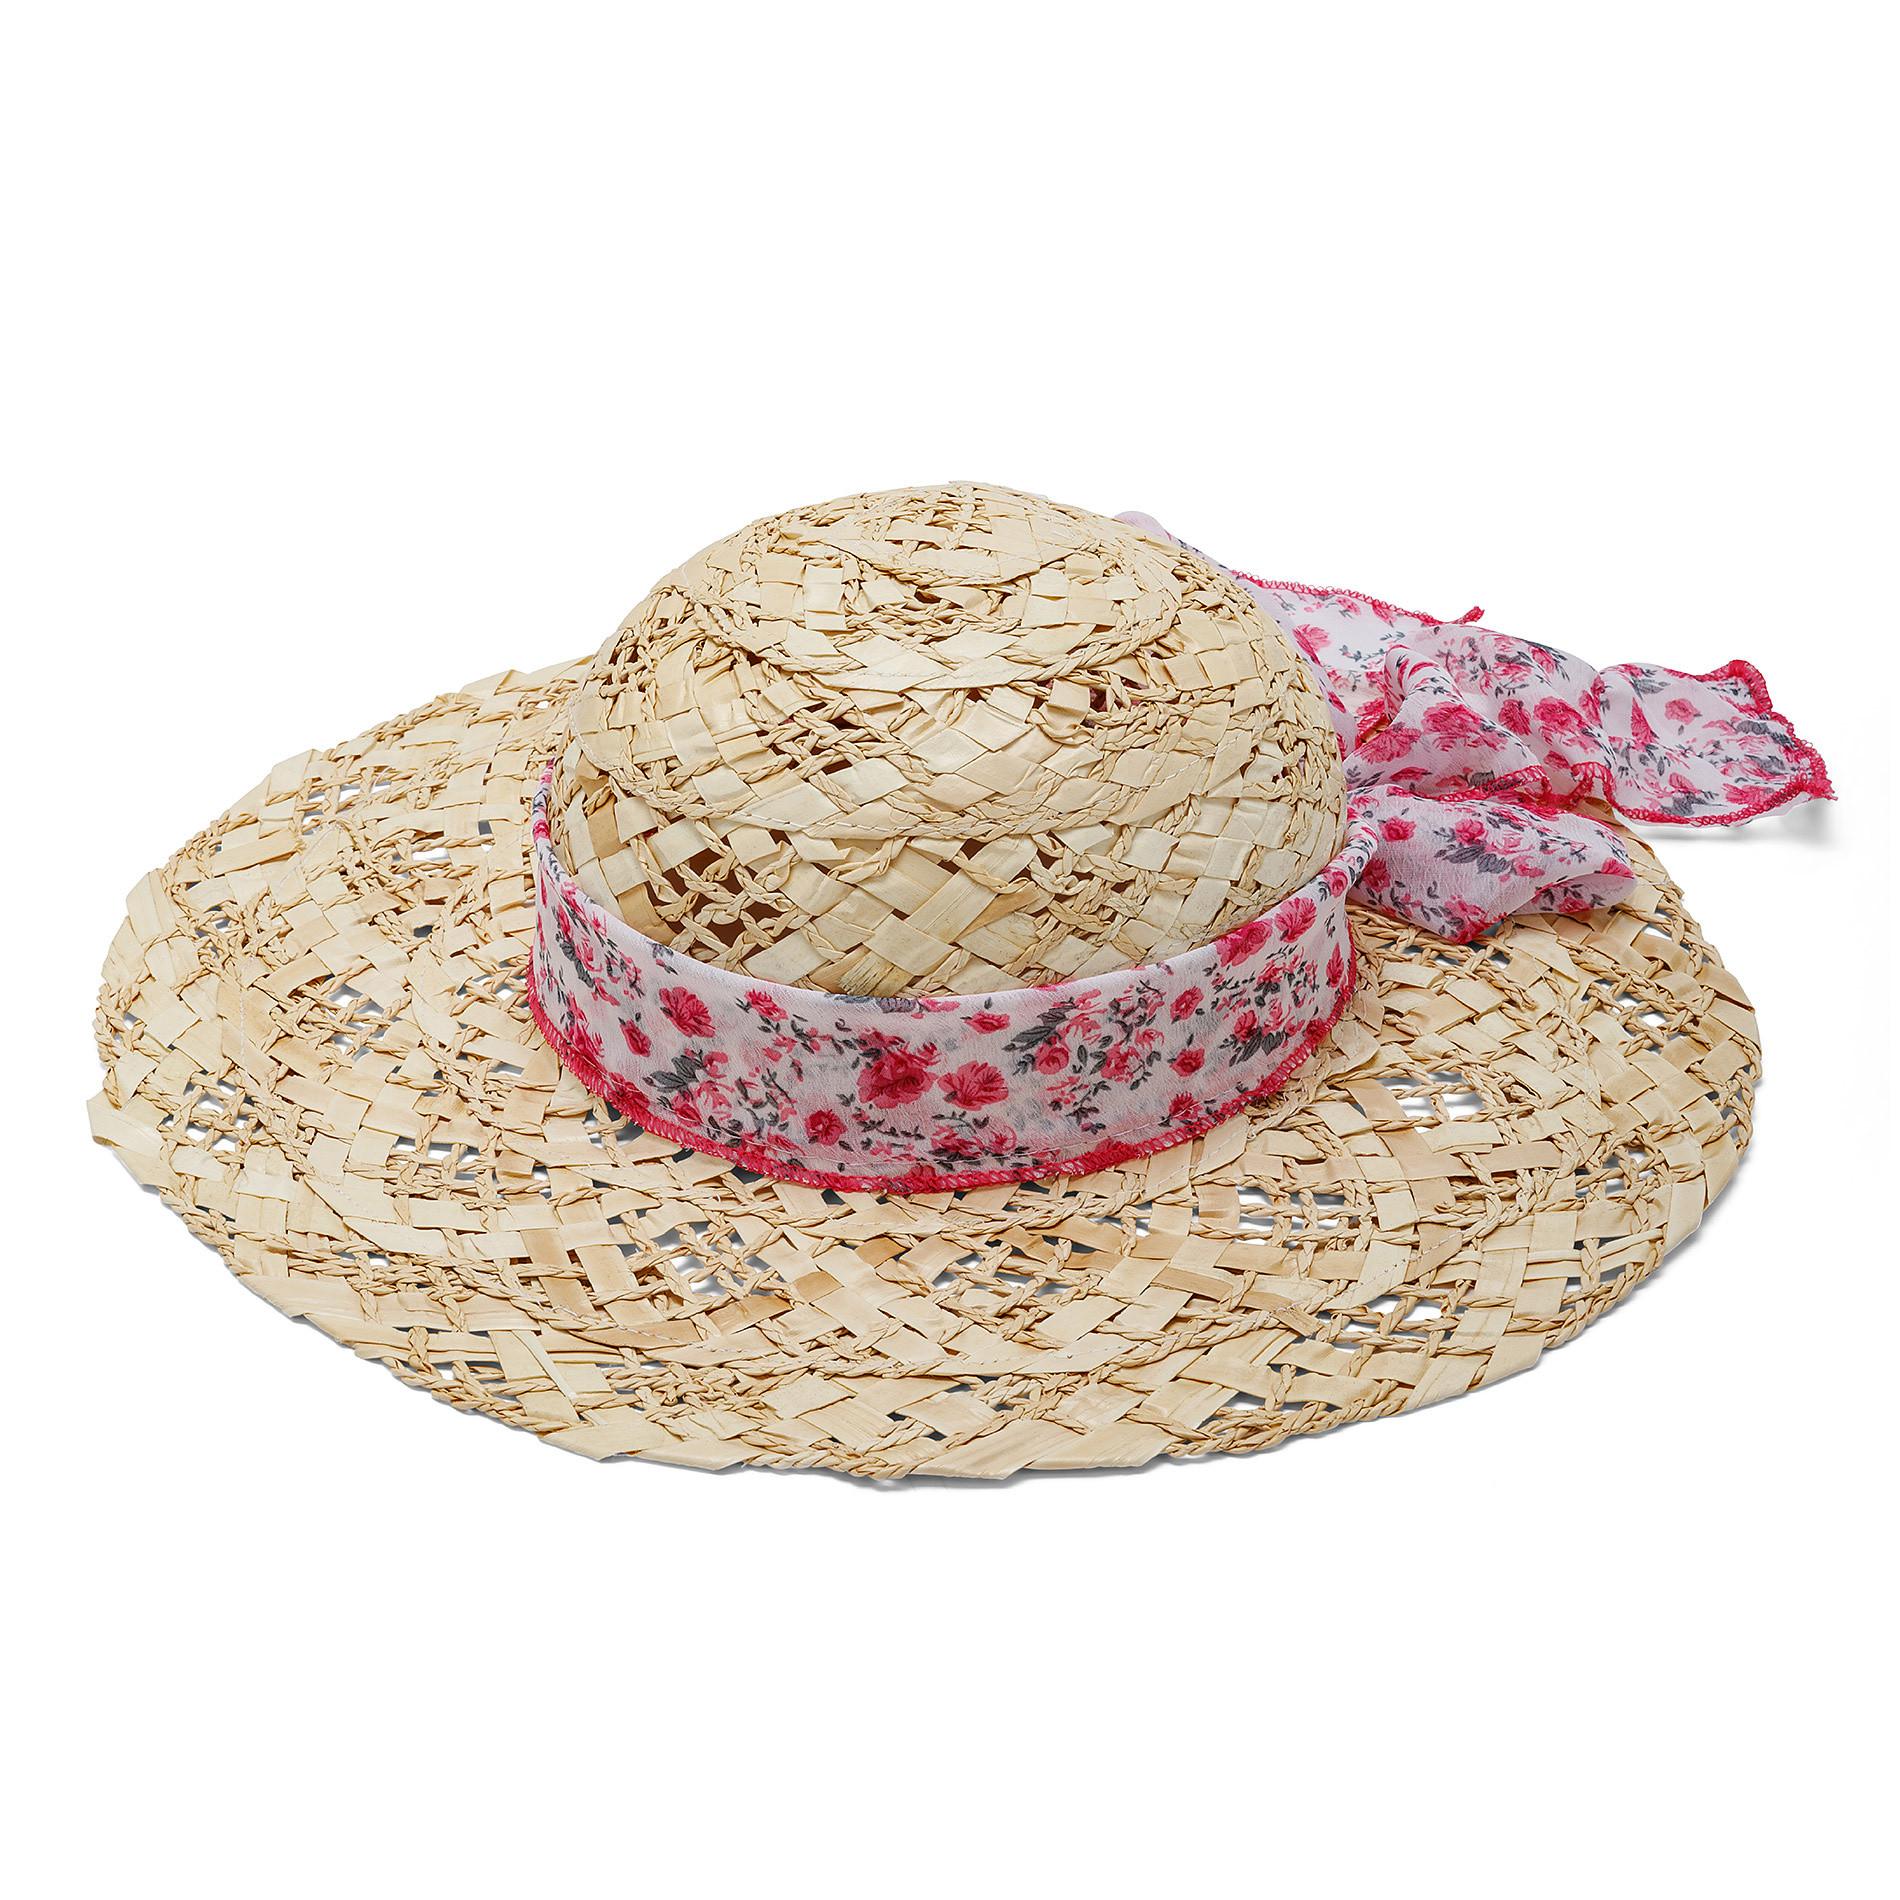 Cappello di paglia con foulard fantasia Koan, Beige, large image number 0